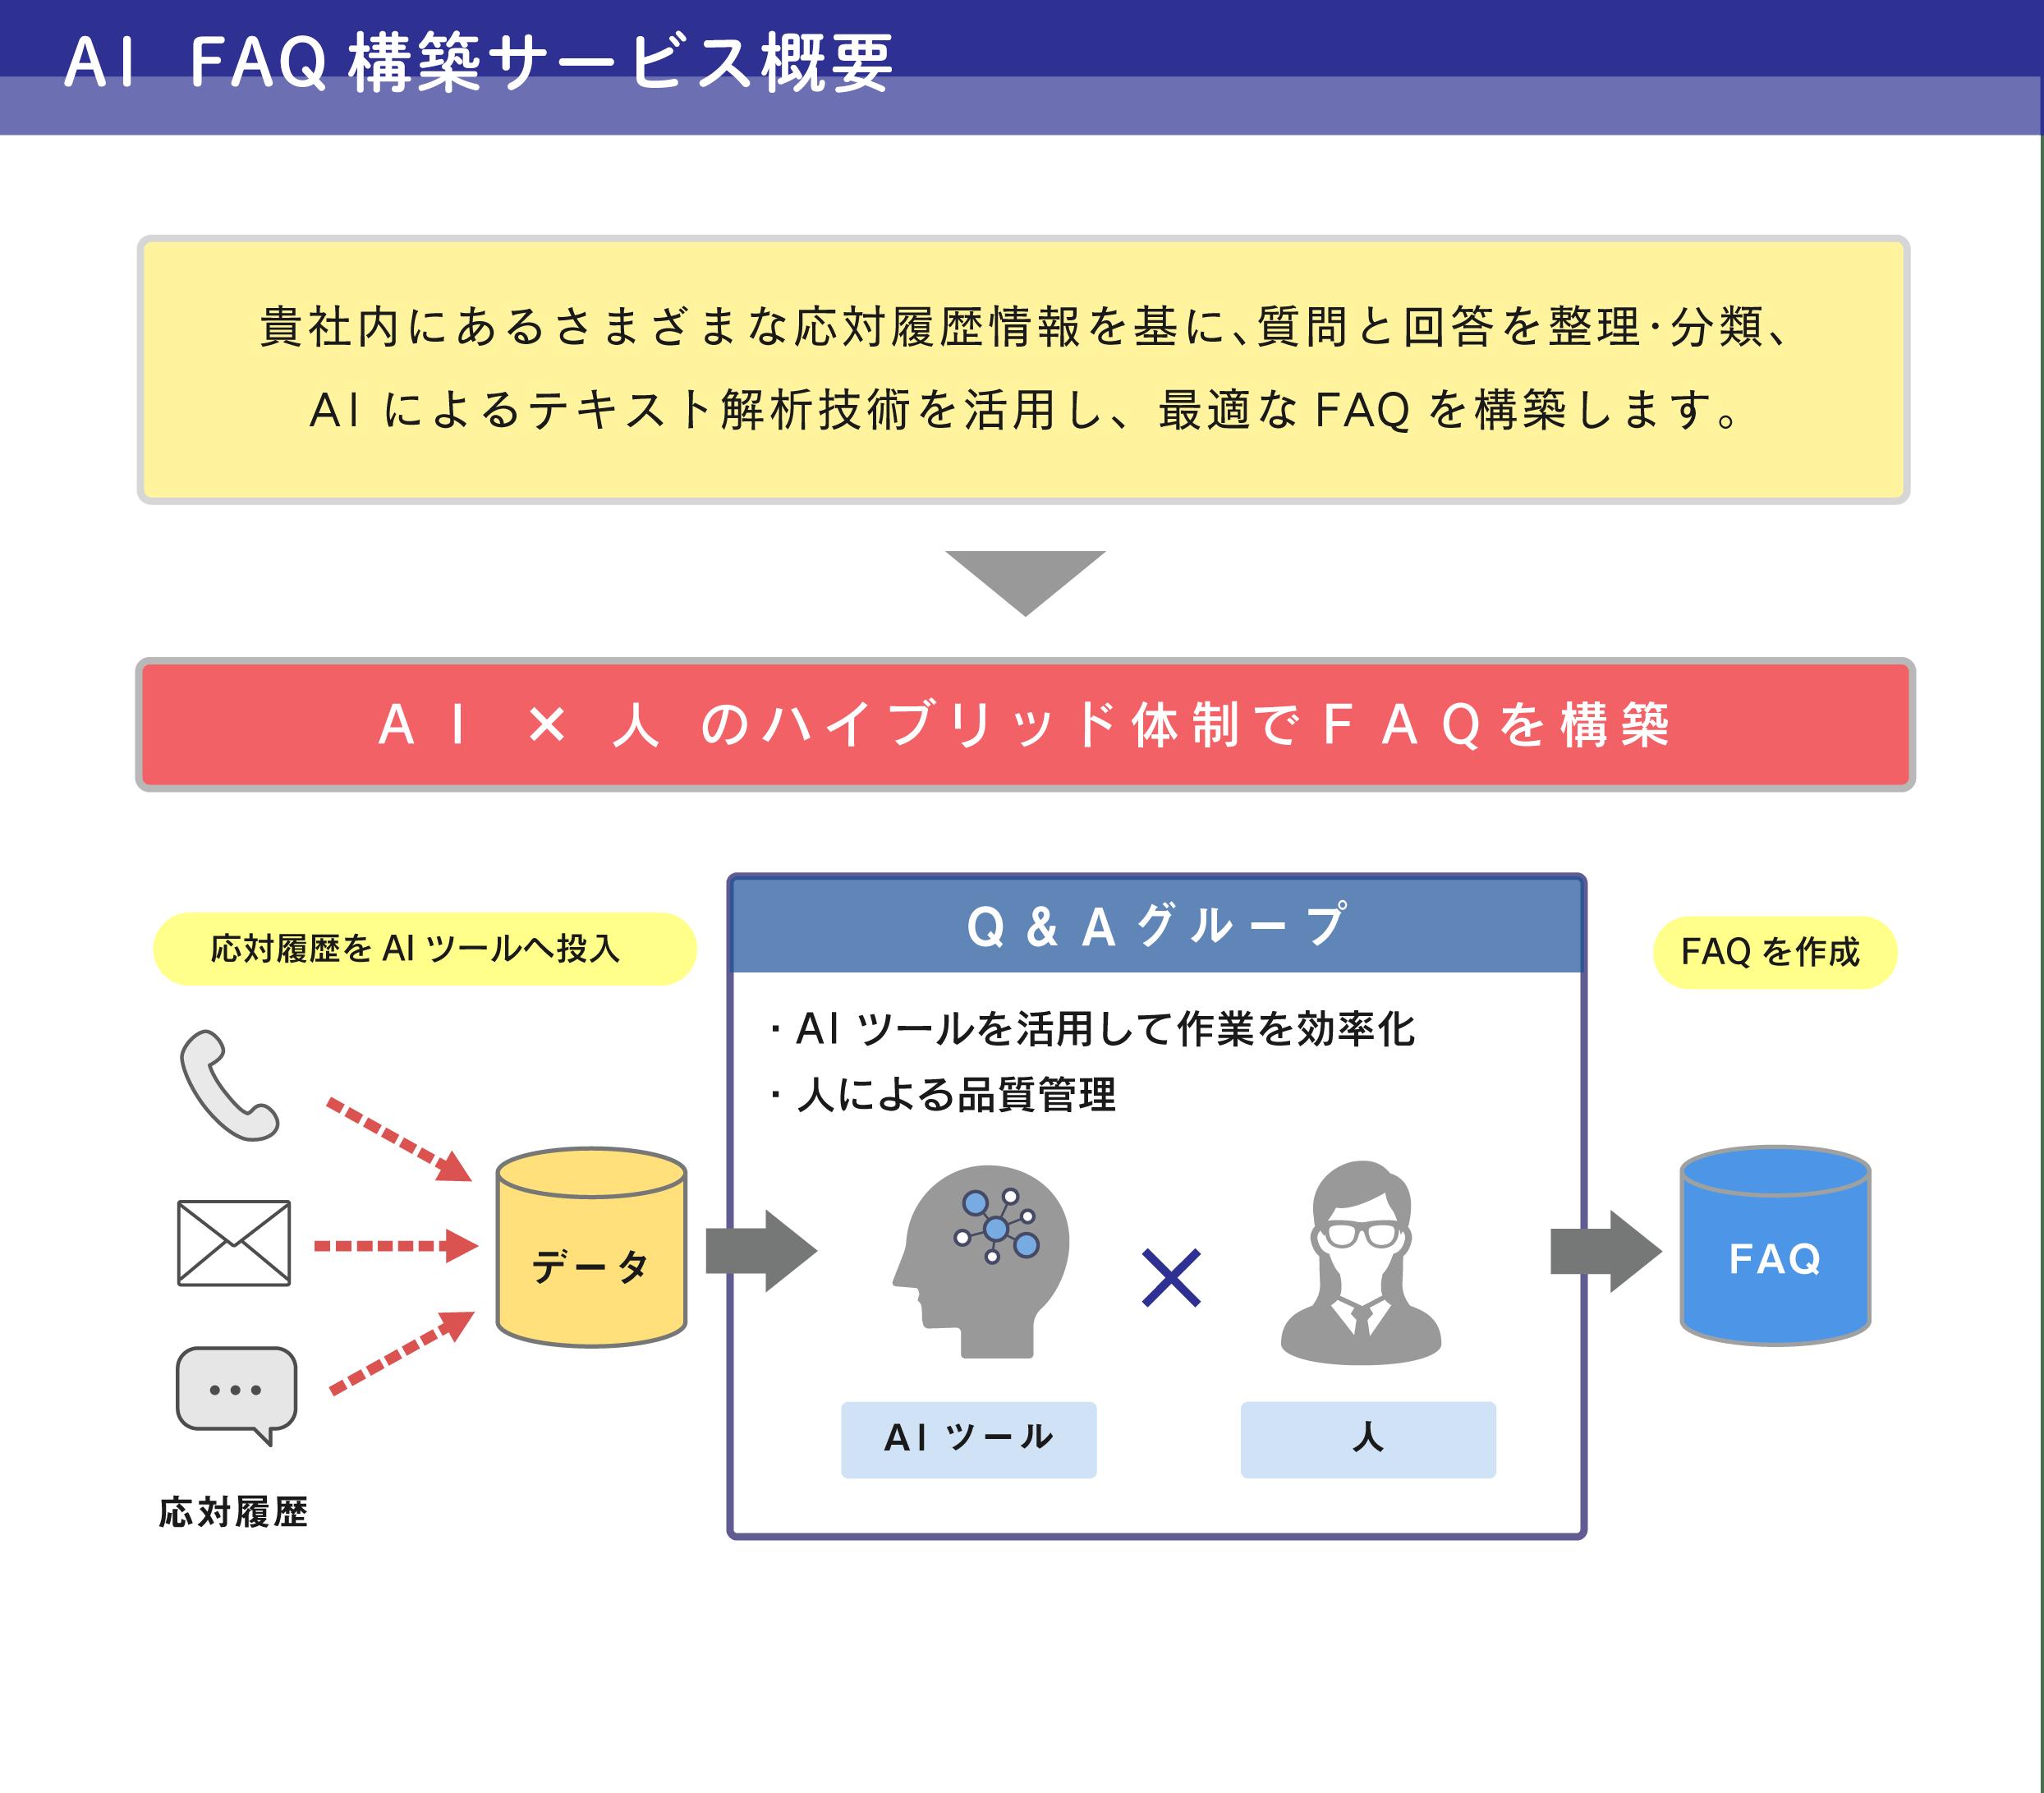 AI_FAQ_Service1